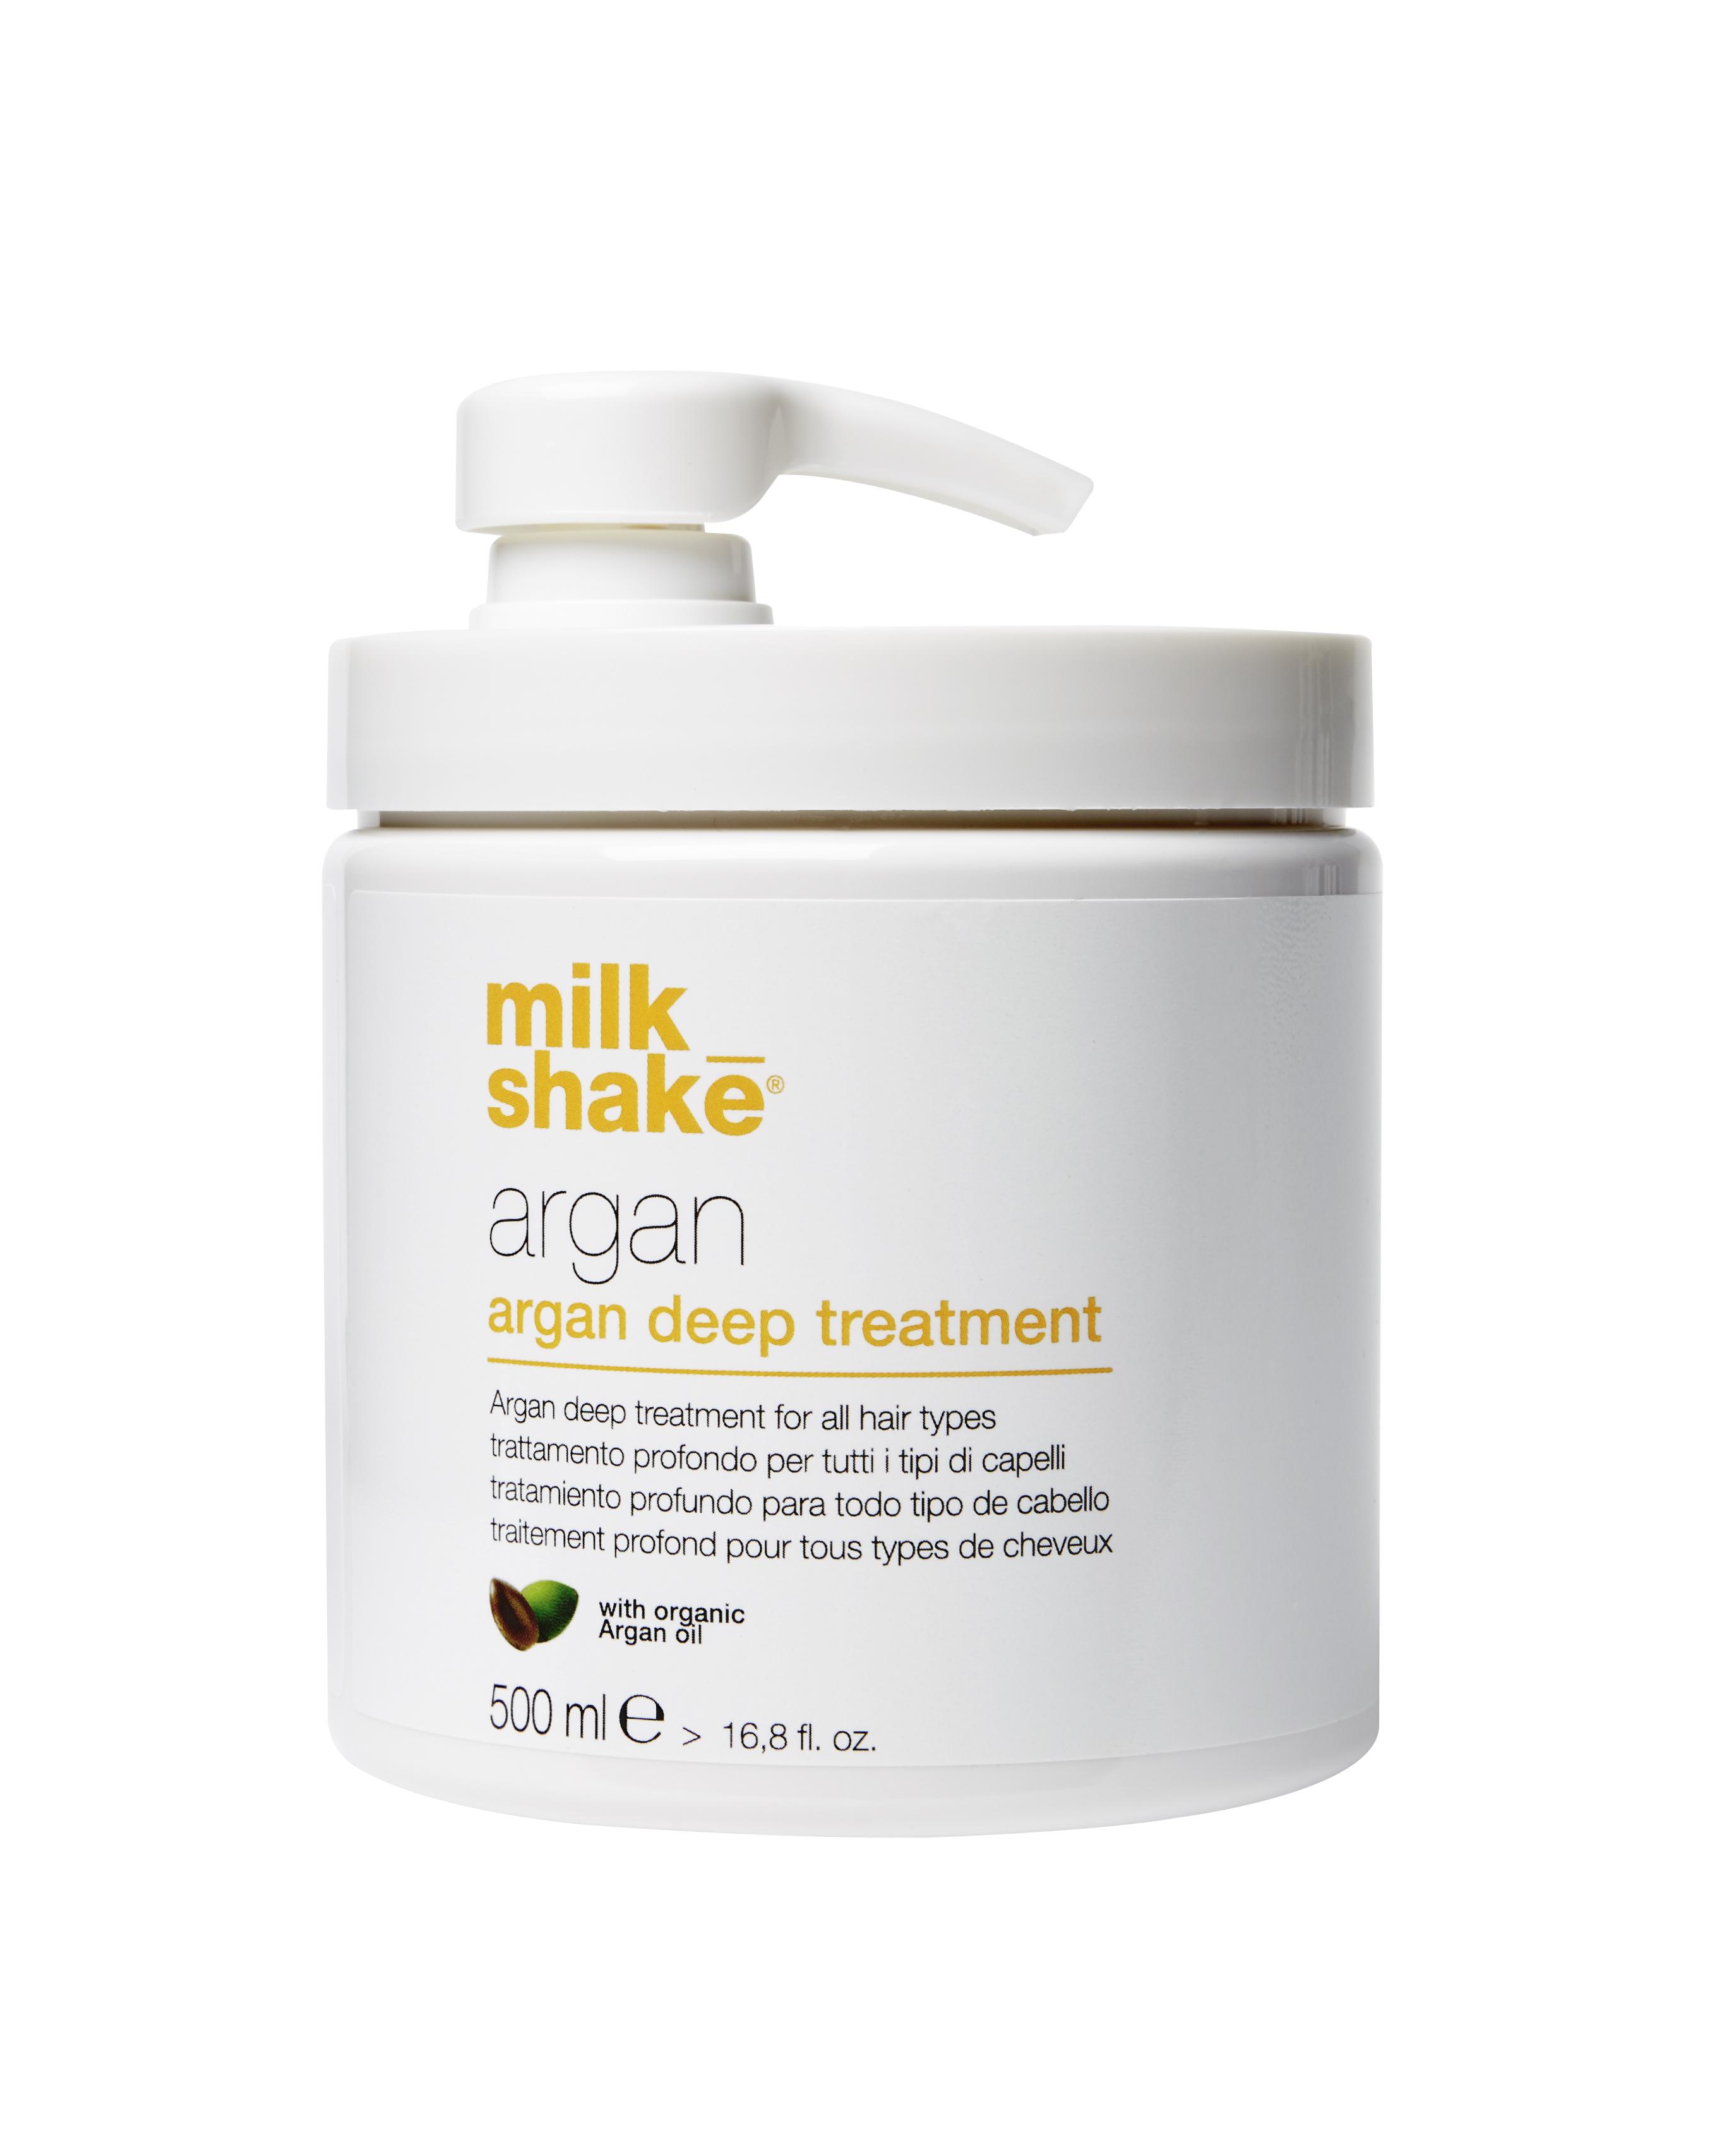 milk_shake - Argan Oil Deep Treatment 500 ml